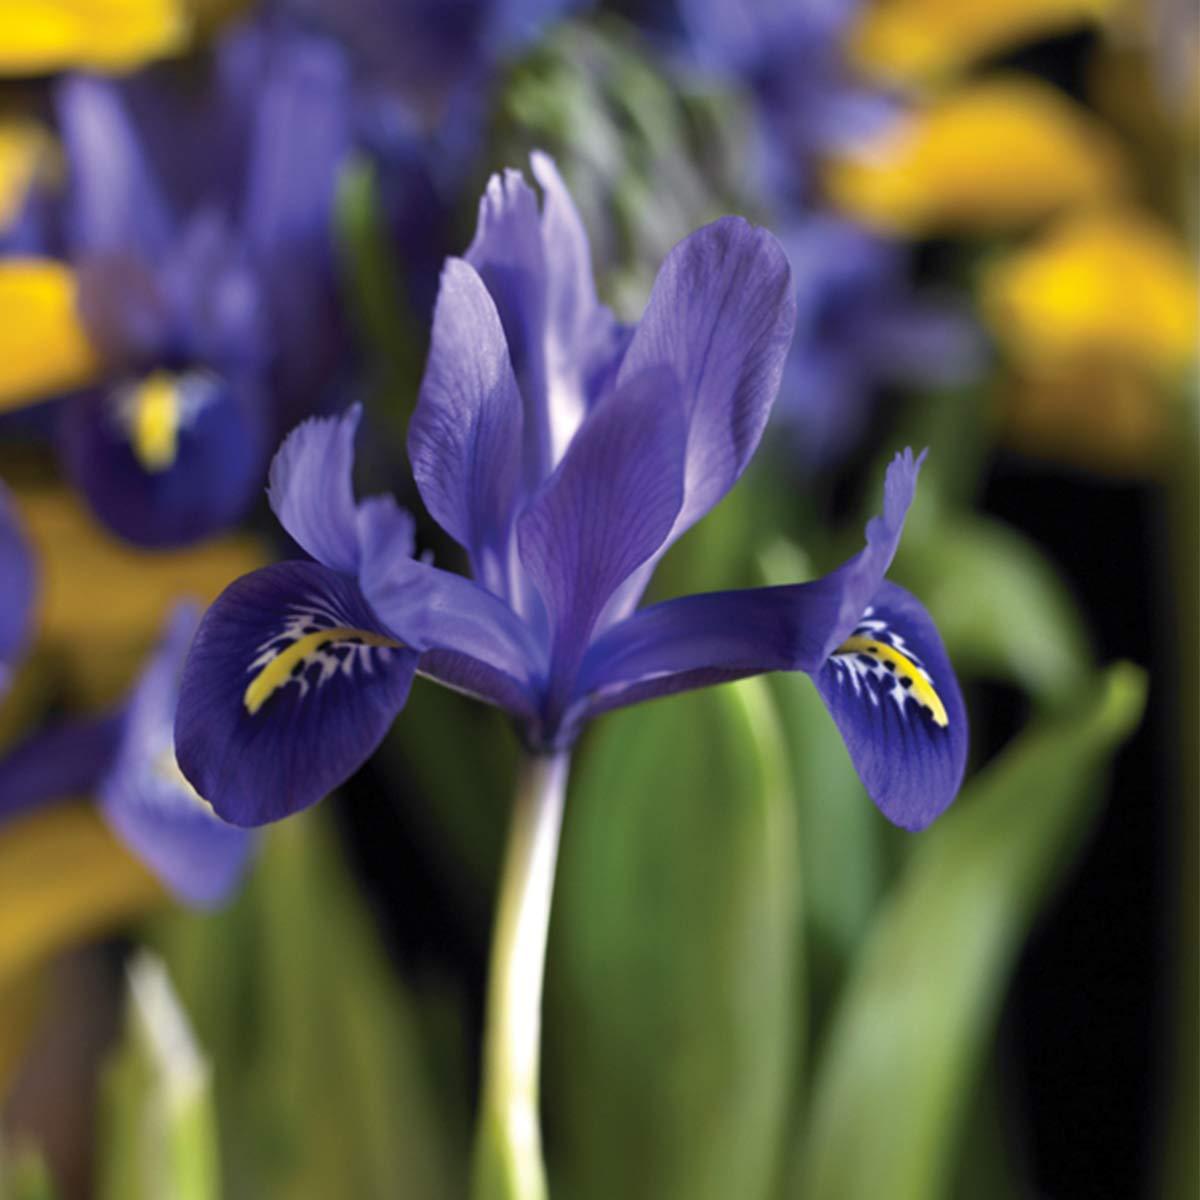 Burpee Harmony Iris Reticulata   15 Large Flowering Fall Bulbs for Planting, Purple